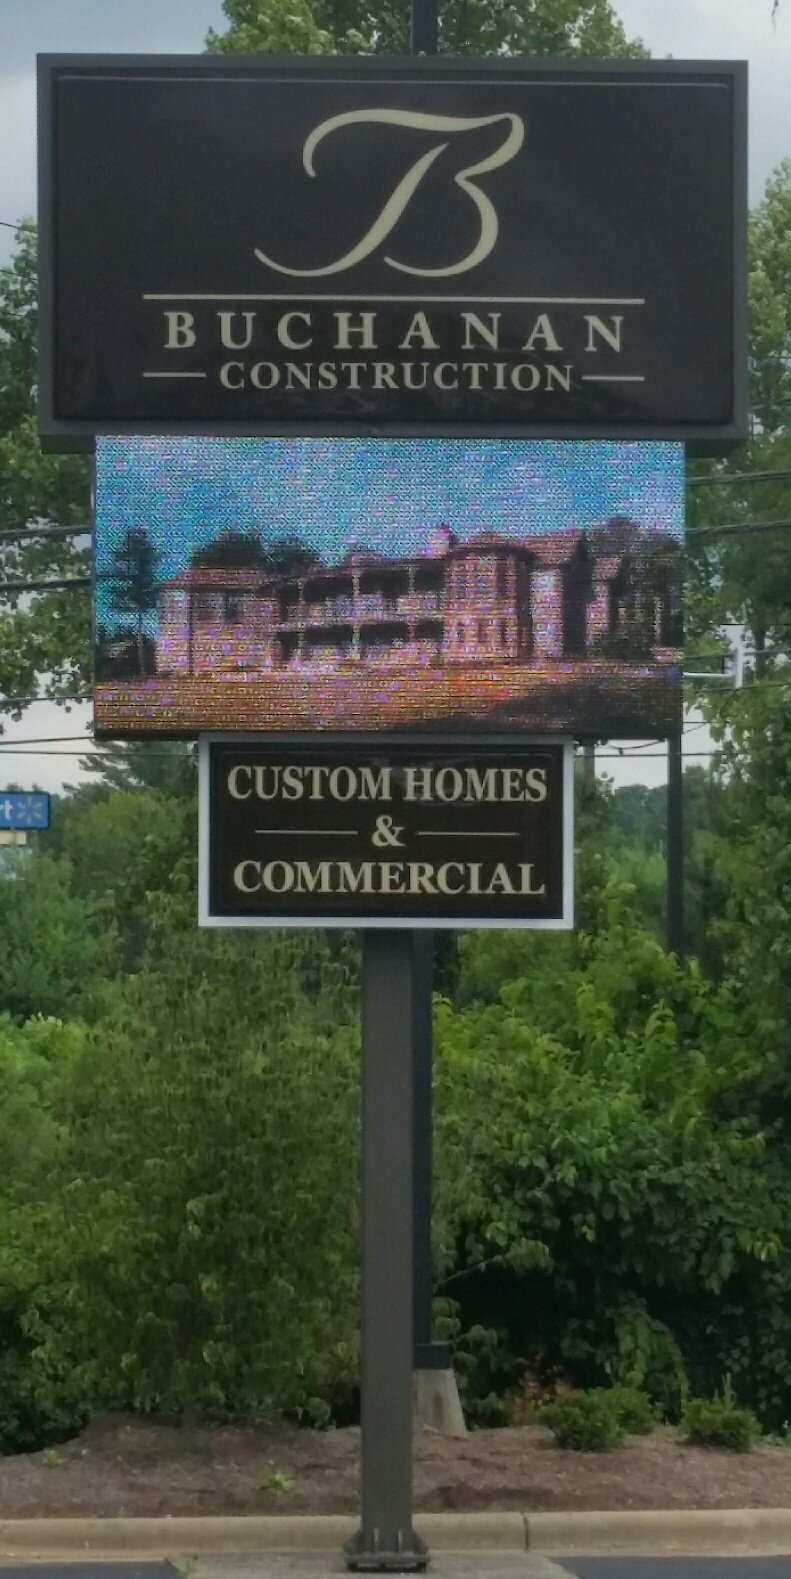 Buchanan Construction, Asheville, NC, Full color LED, 16mm, 4x8